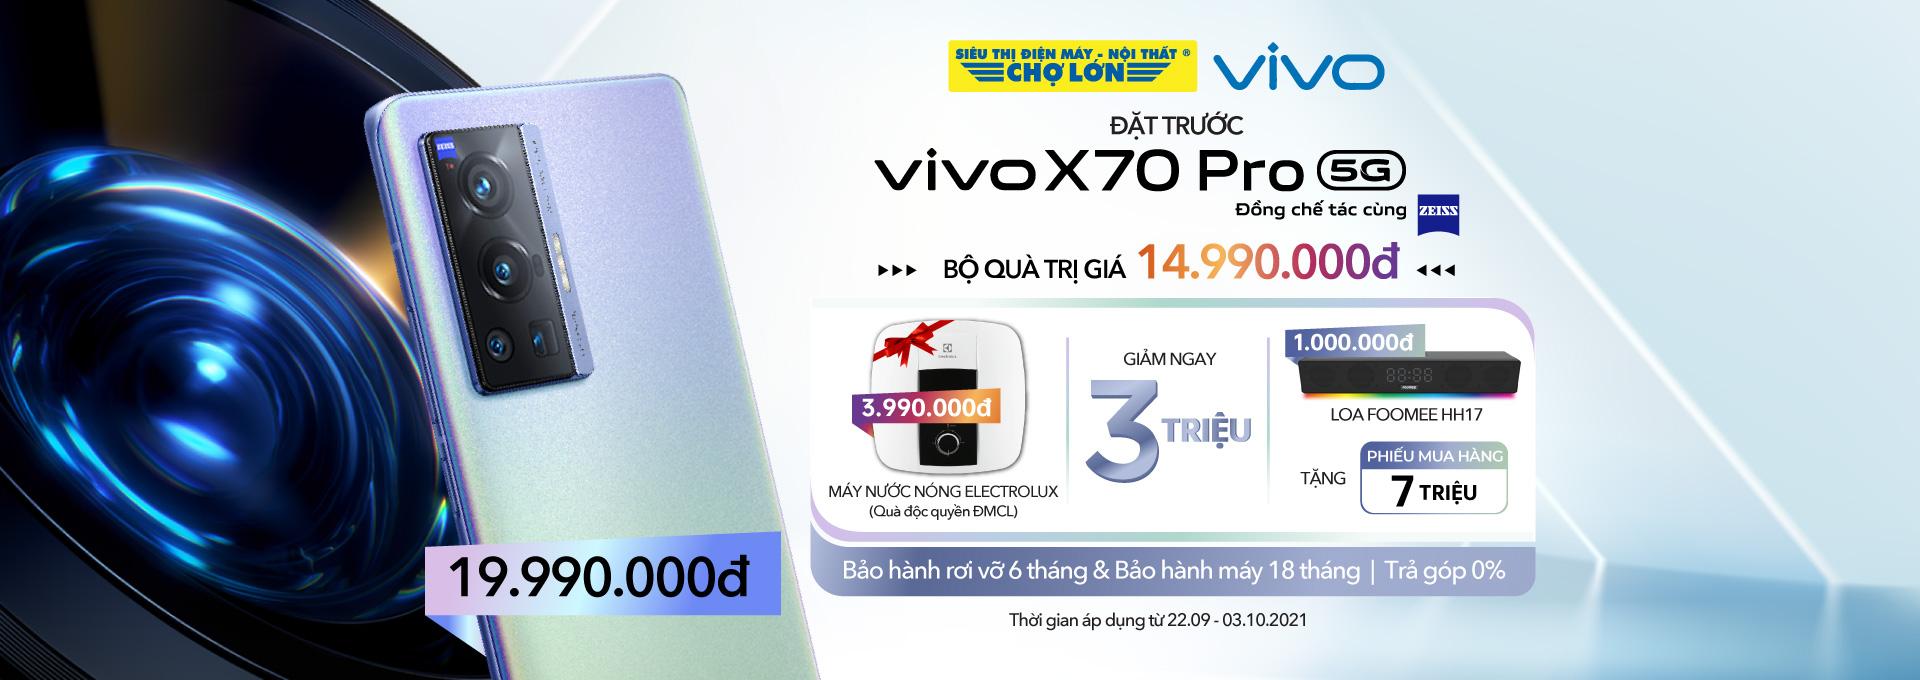 Vivo X70 Pro 5G